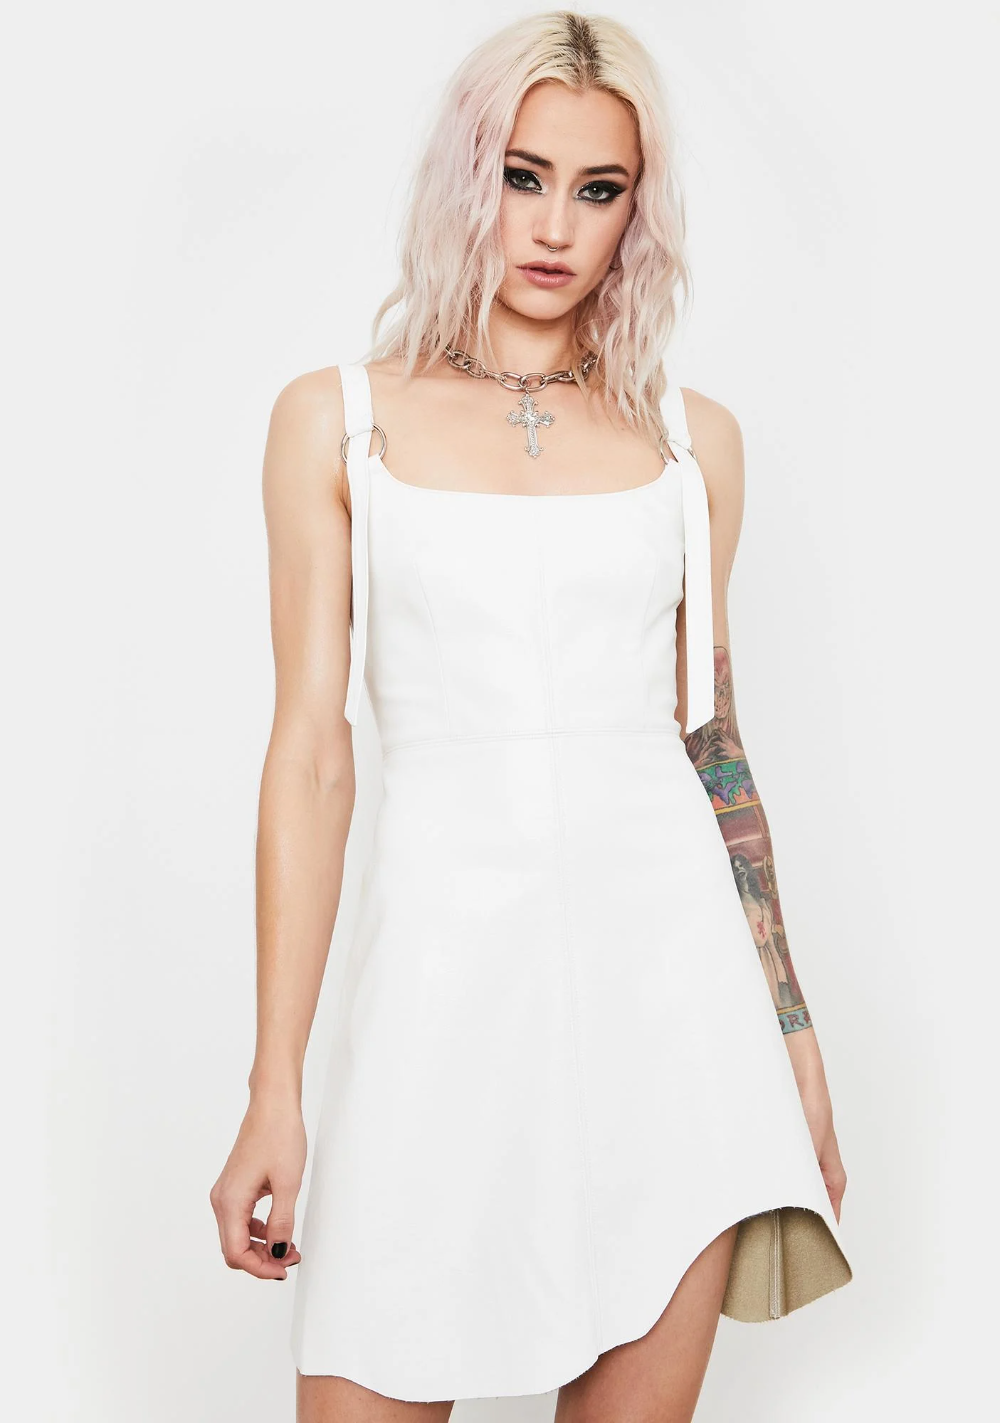 Power Chord Vegan Leather Dress Leather Dress Lace Up Leggings Dresses [ 1423 x 1000 Pixel ]